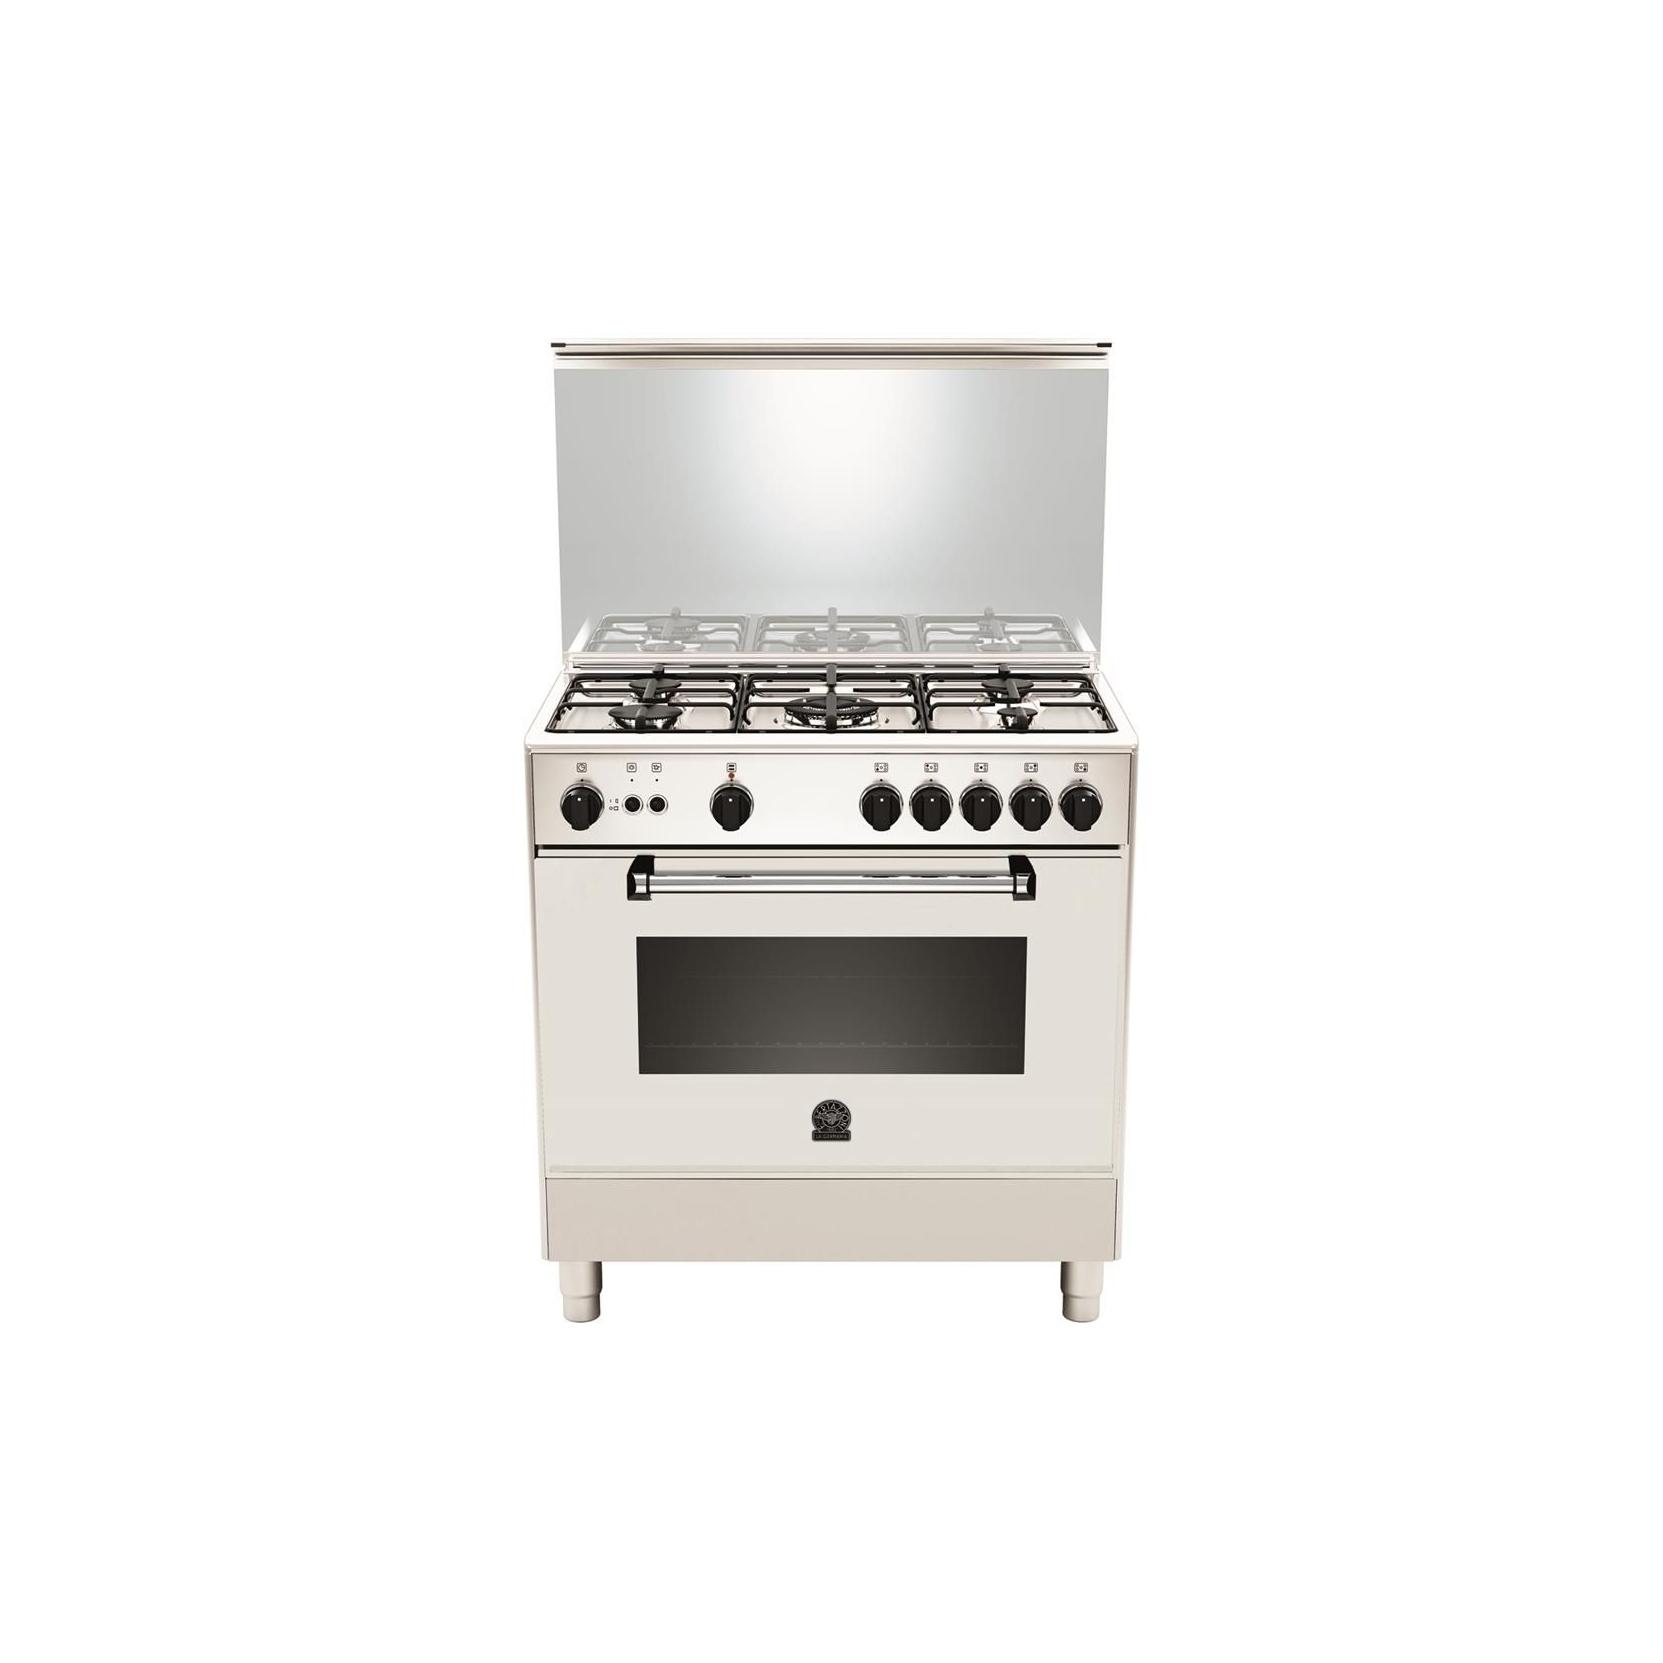 Cucina a gas la germania am85c71dw 5 fuochi a gas forno a for Forno a gas